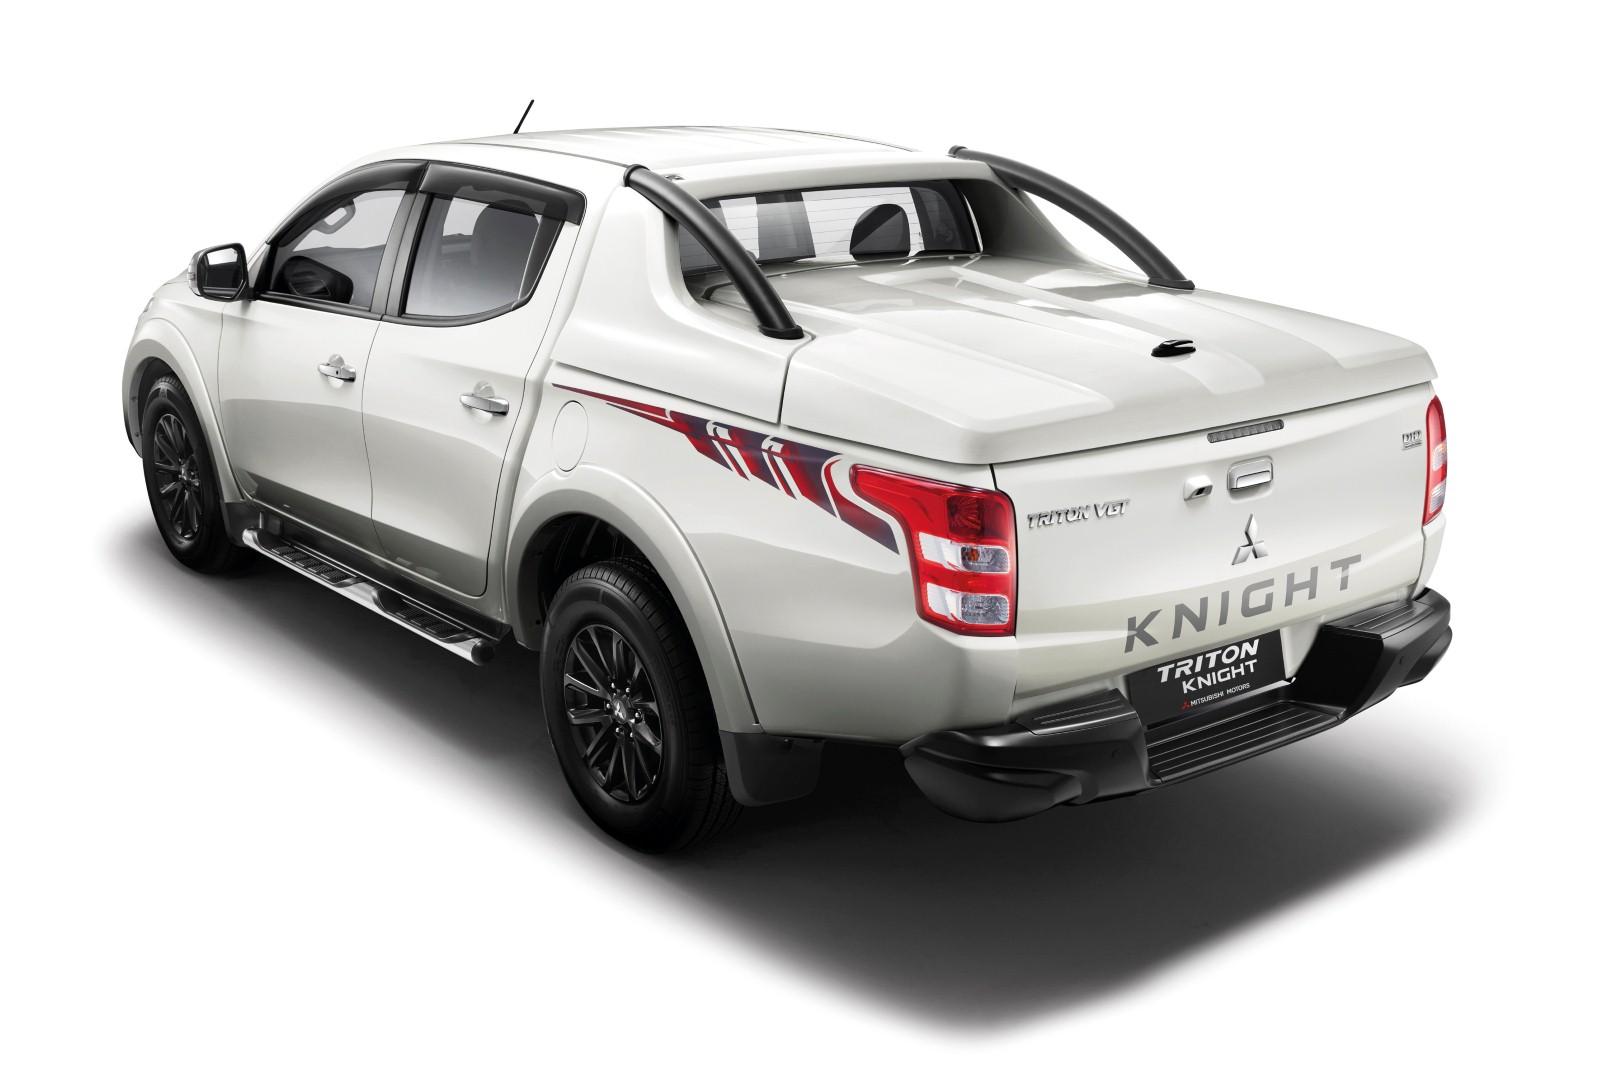 Бренд Mitsubishi презентовал роскошный пикап Triton Knight 2016 2